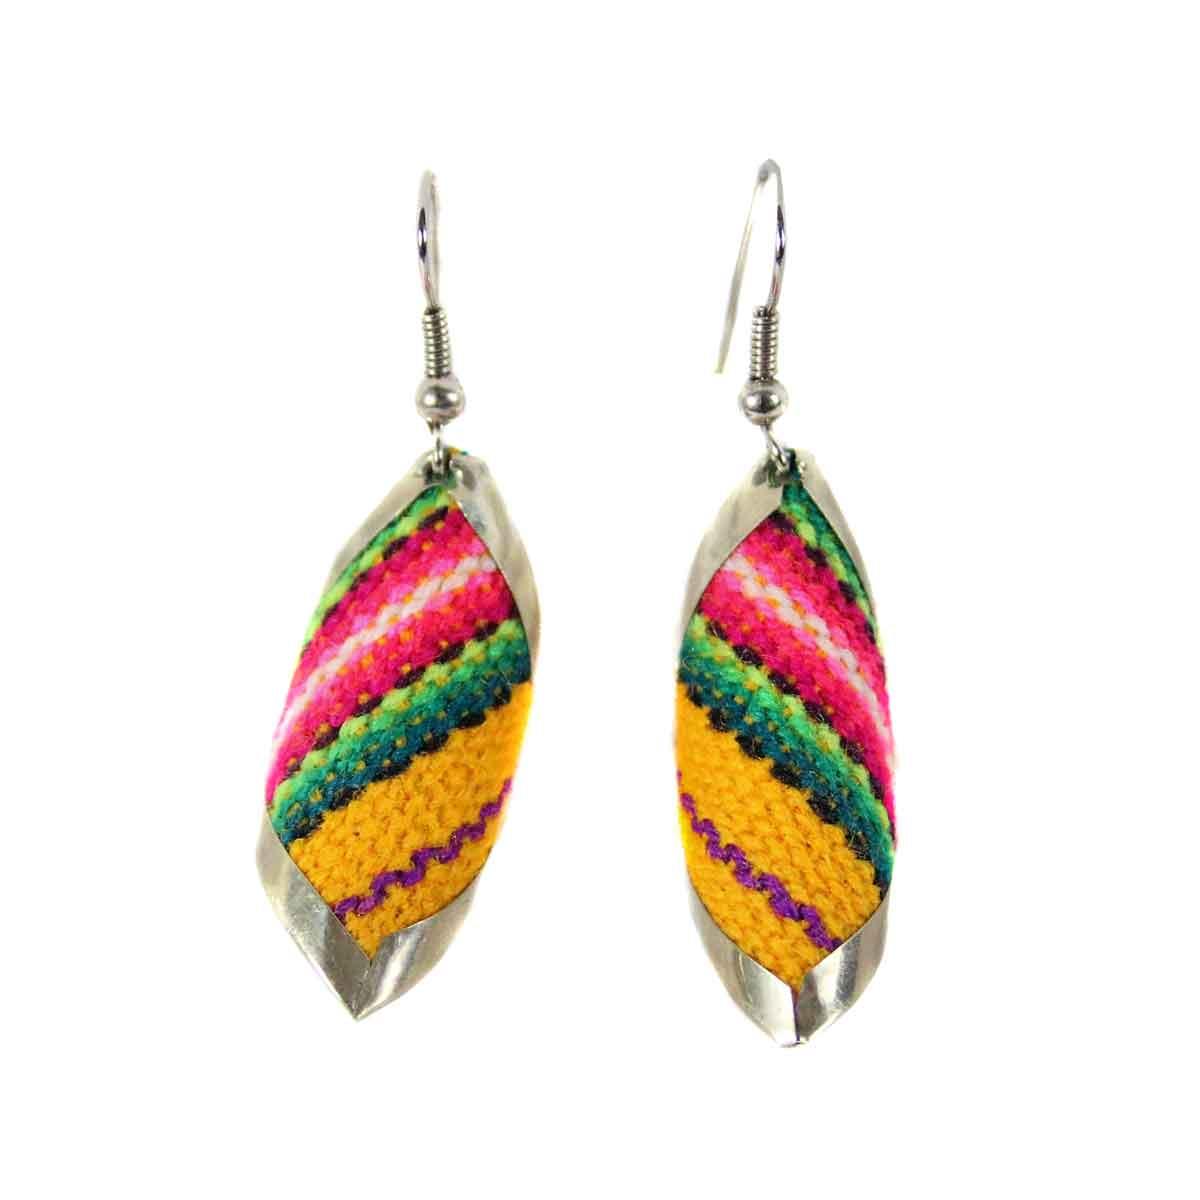 Inka-Products-Boucles d'Oreilles Tissu Traditionnel Péruvien-Carré Spiral Jaune